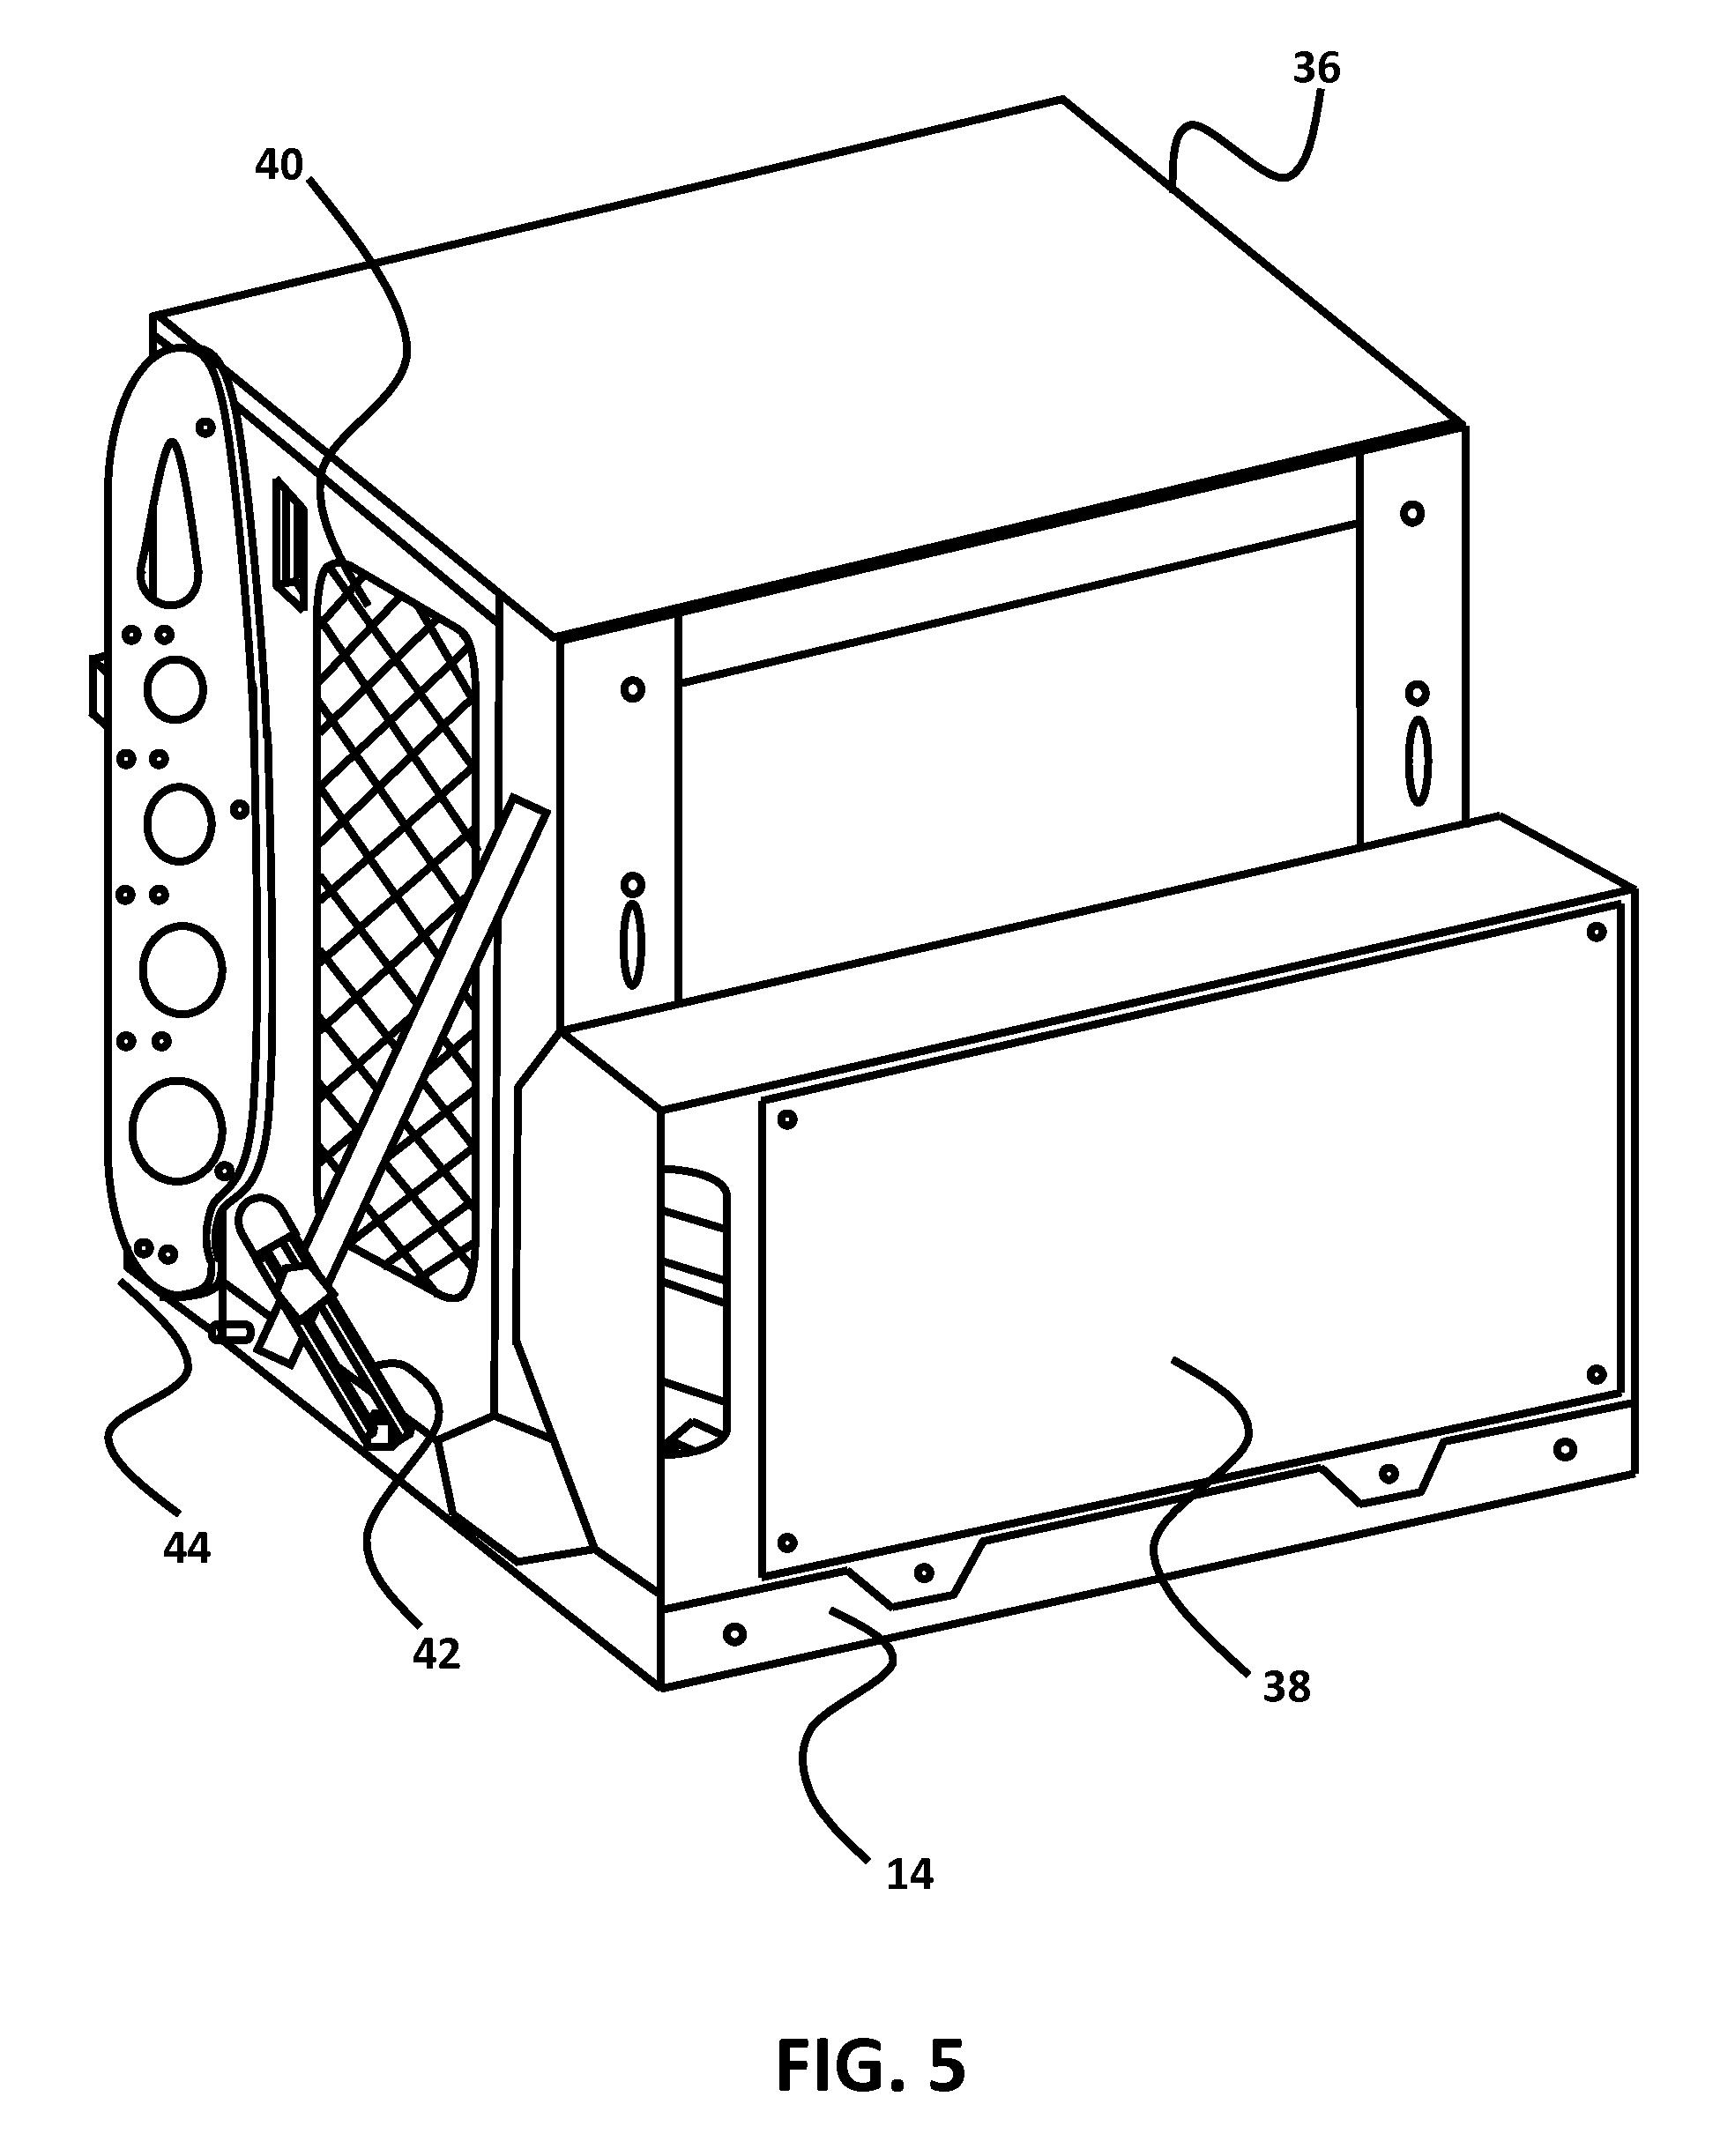 28+ [ Genteq Motor Wiring Diagram ]   genteq motor 42 wiring diagram motor  download free ge x13 motor wiring diagram free wiring diagram images,ge ecm motor  wiring ecm download free printabledulecr01.adtddns.asia